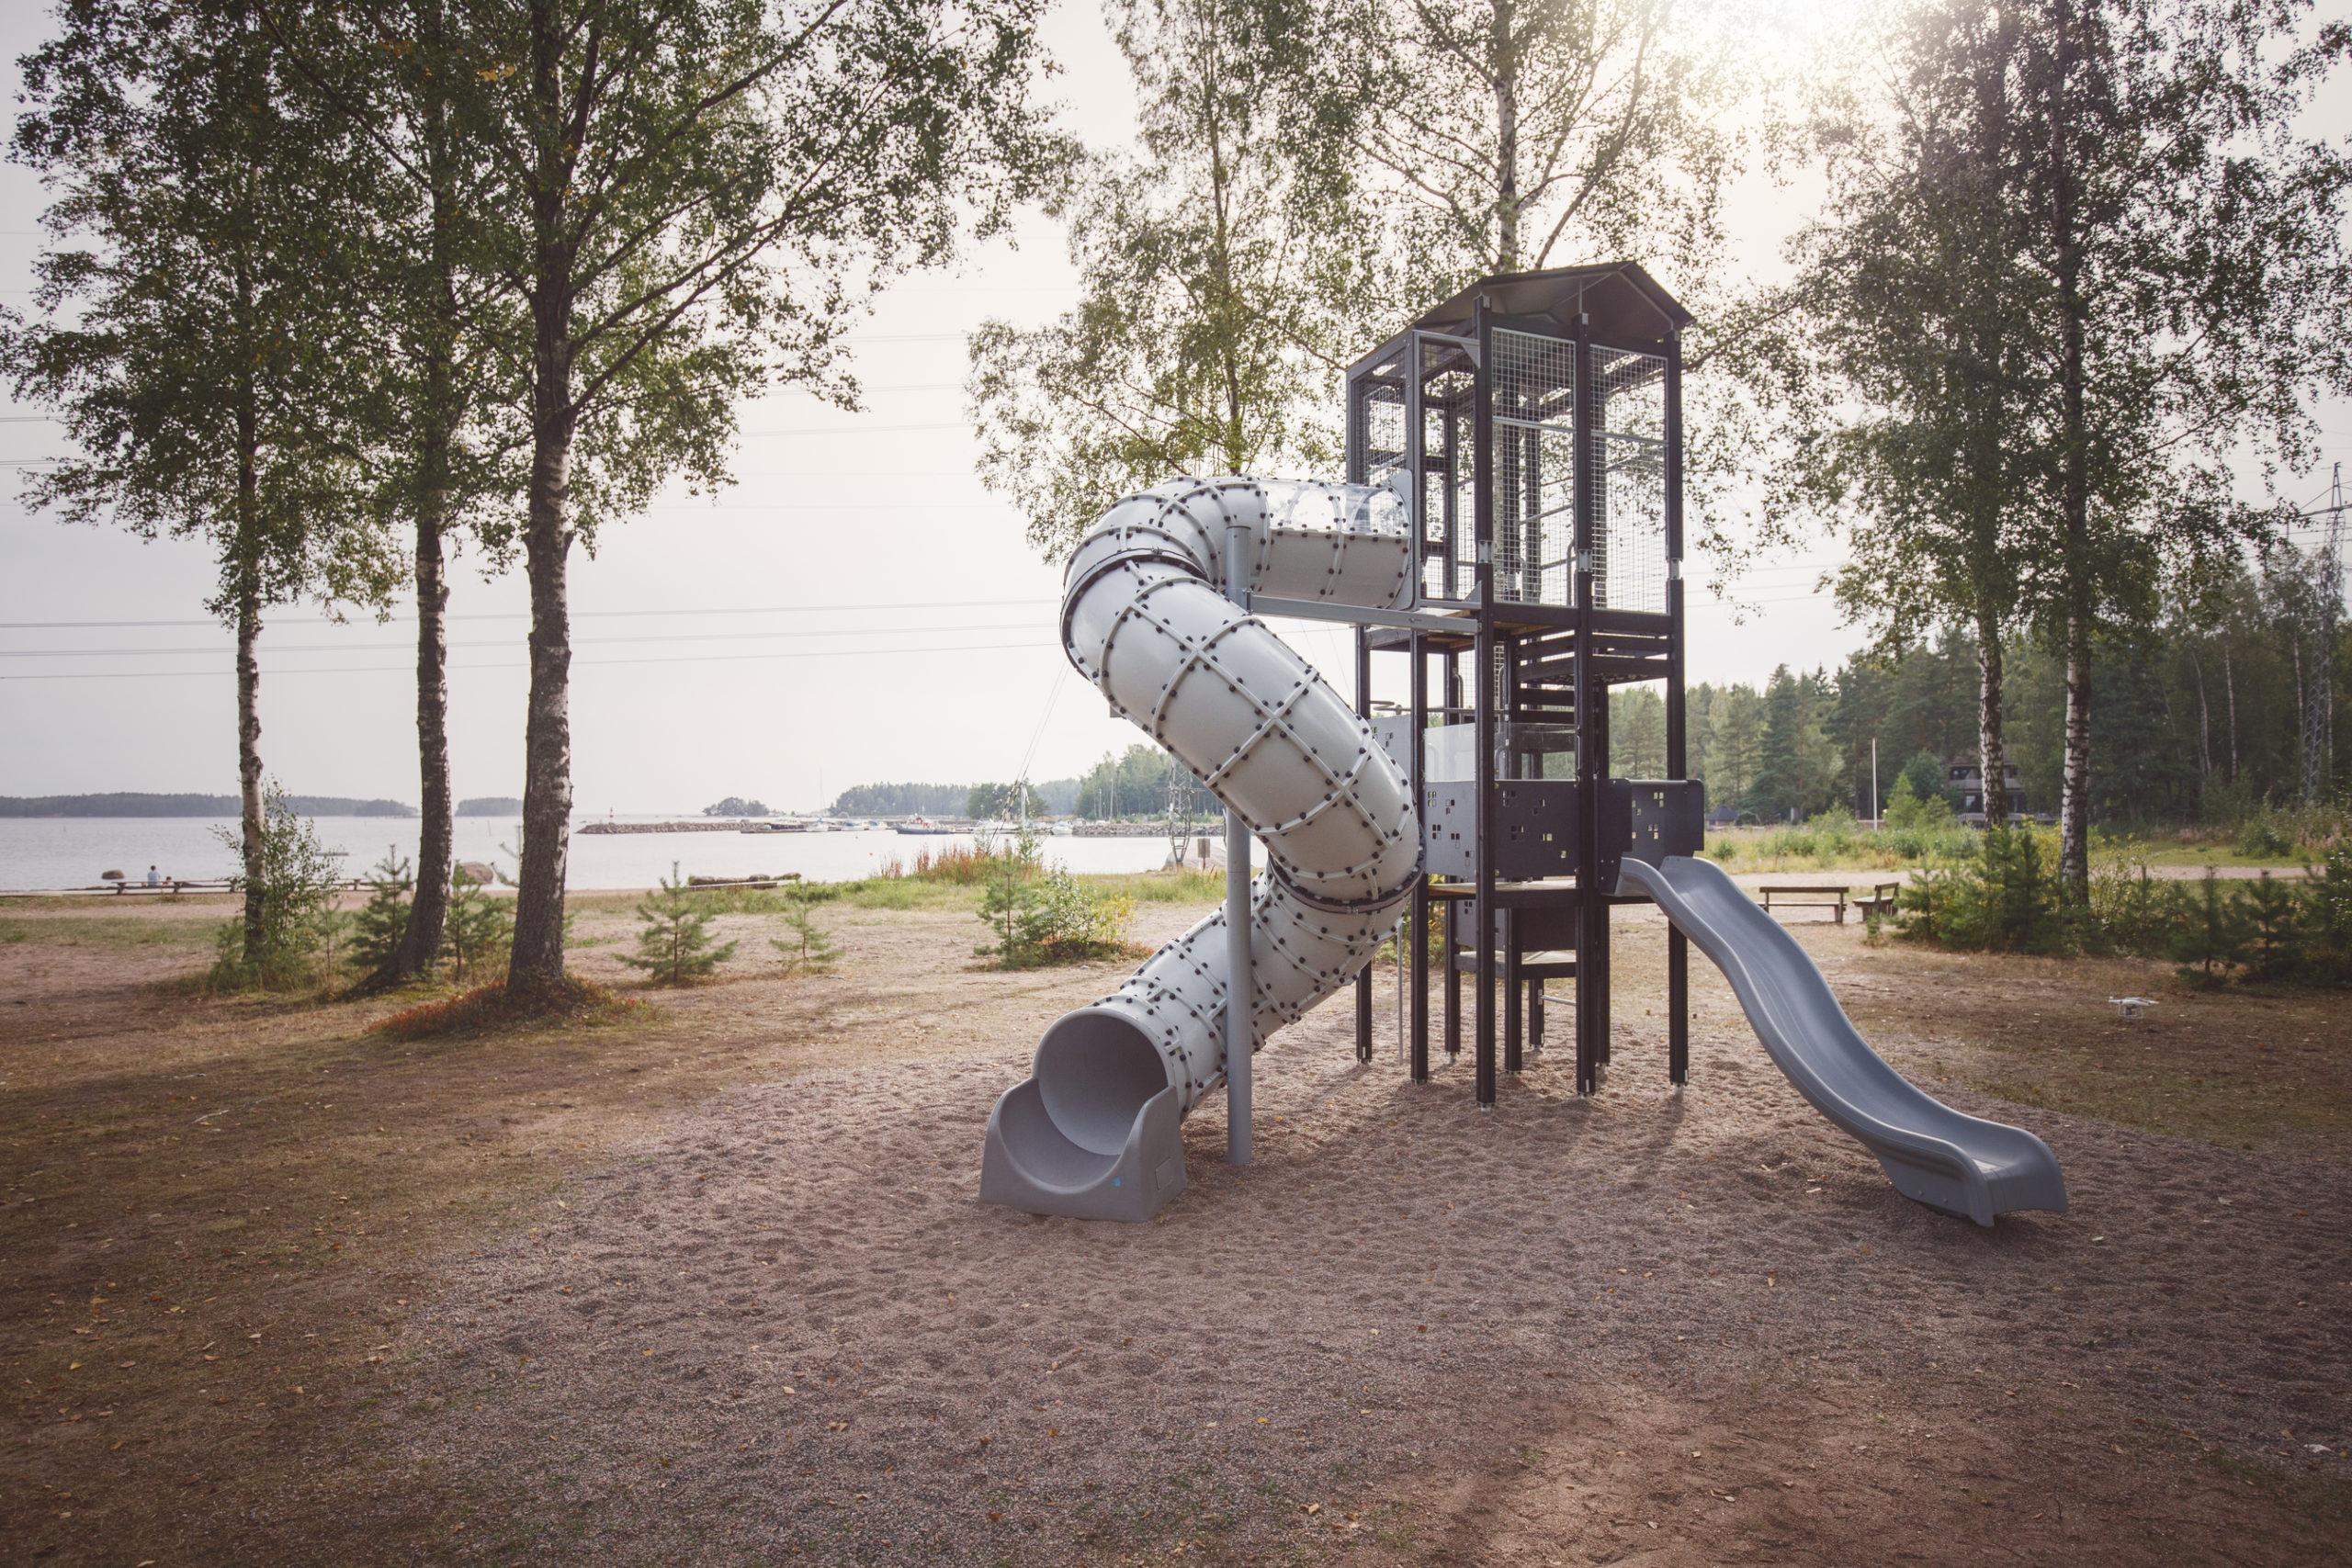 playground multiplay activity tower